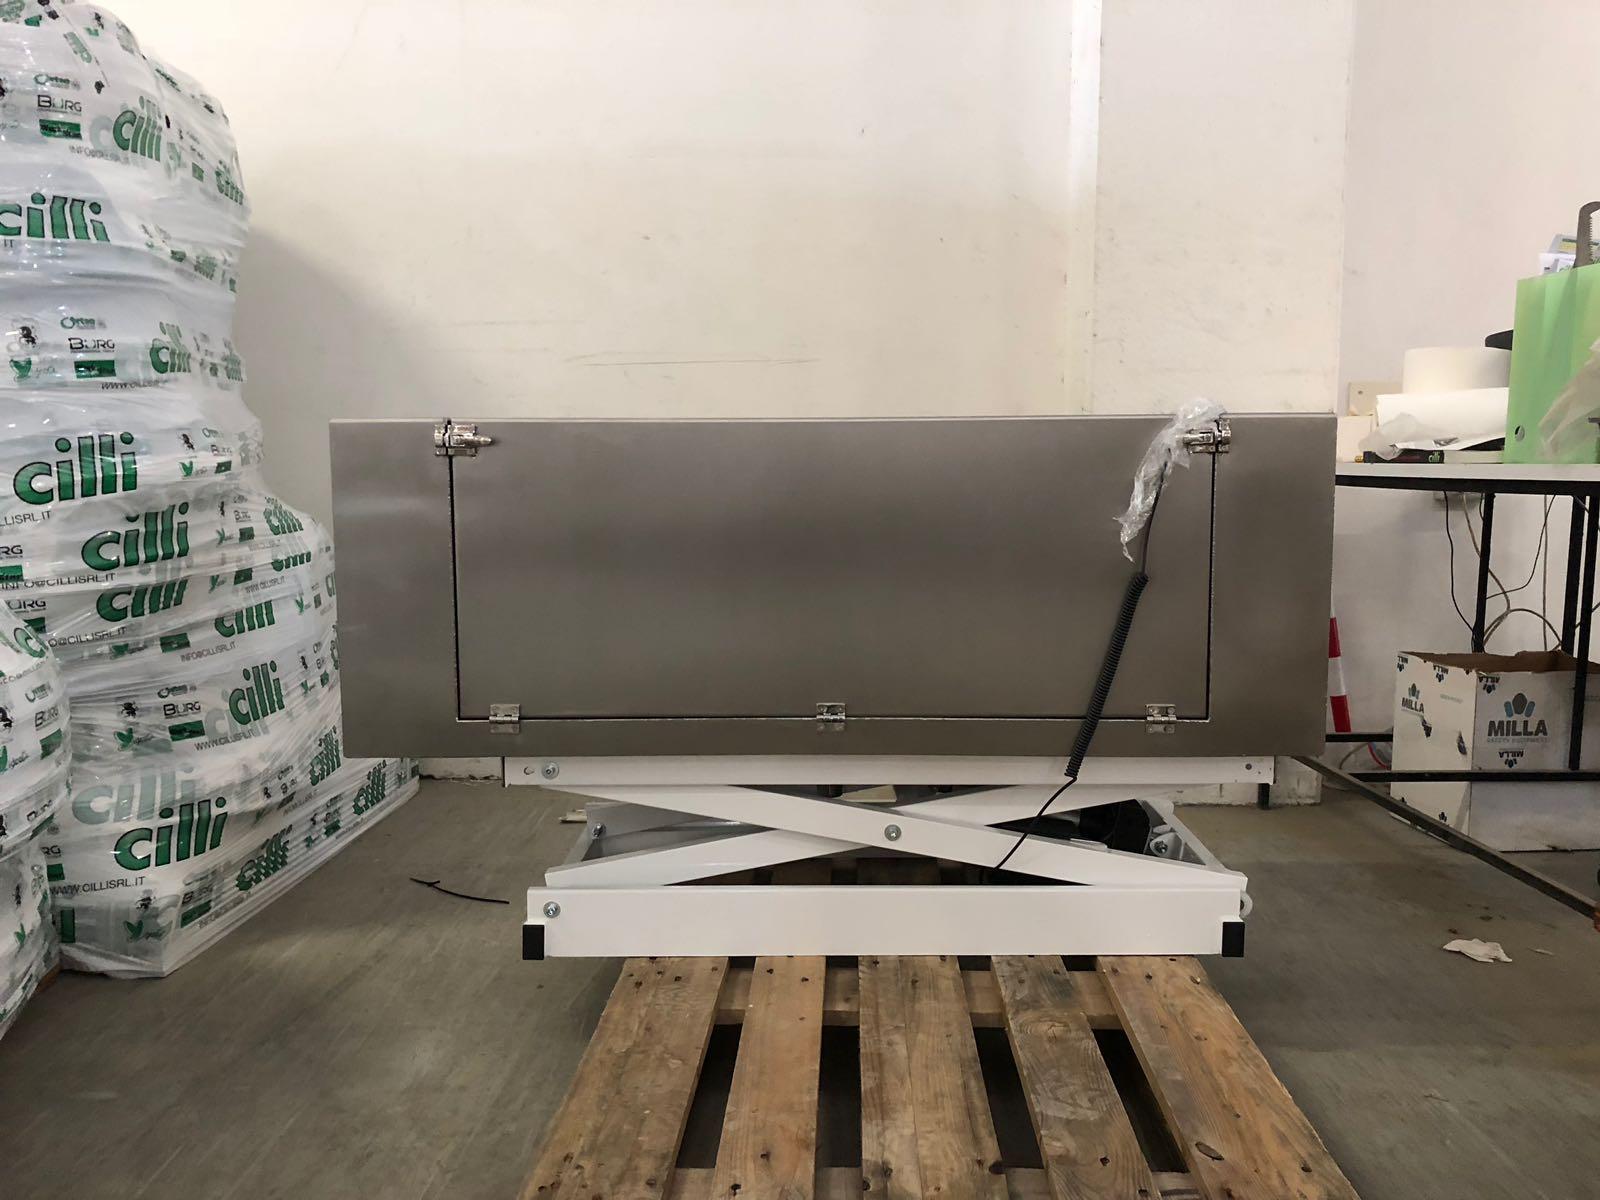 Vasca Da Toelettatura Cani : Vasca elettrica o idraulica con base a pantografo u mac pets